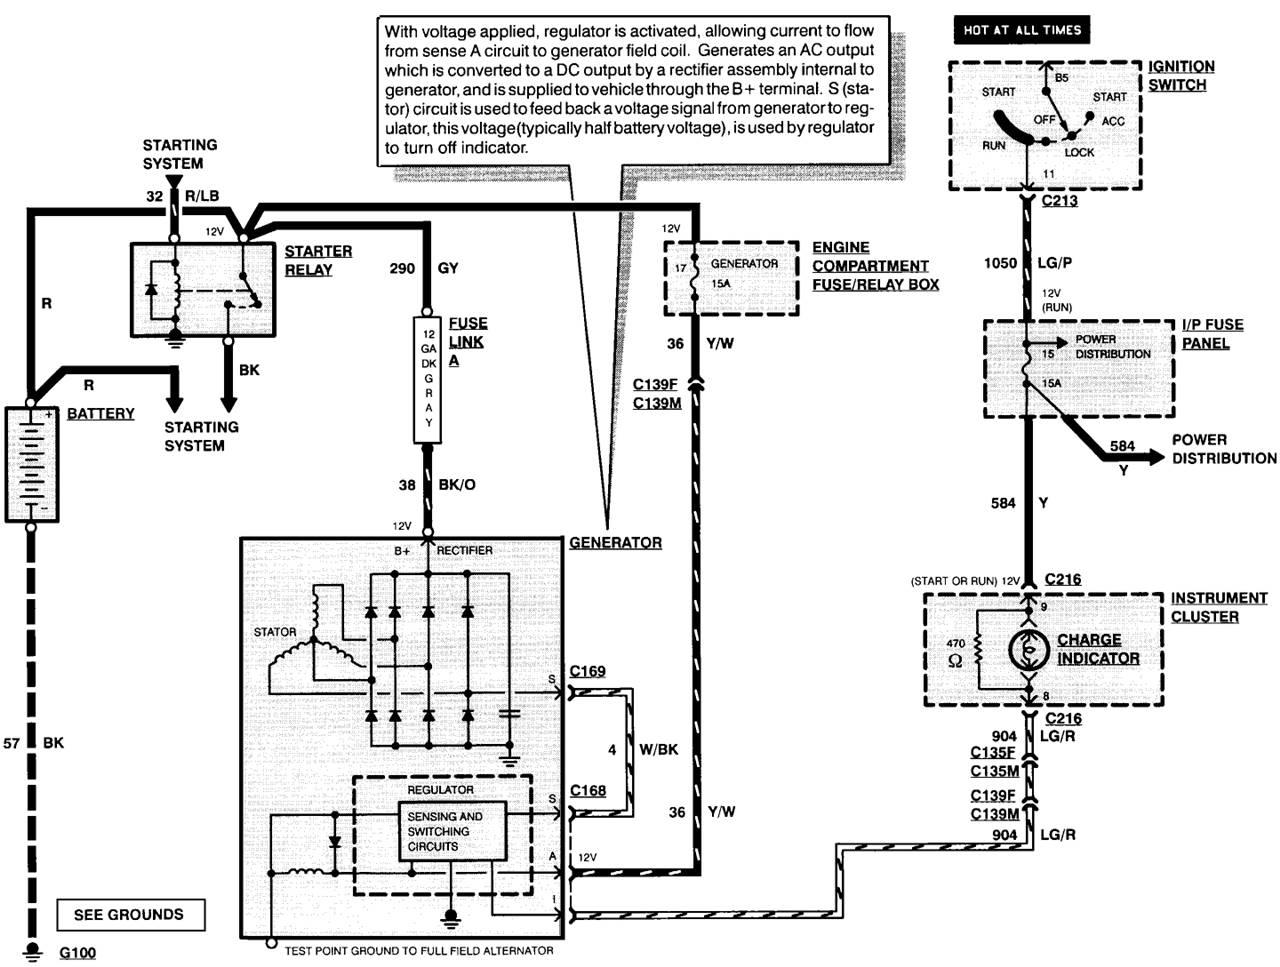 Pleasant 1983 Ford Bronco Wiring Diagram Today Diagram Data Schema Wiring Cloud Faunaidewilluminateatxorg